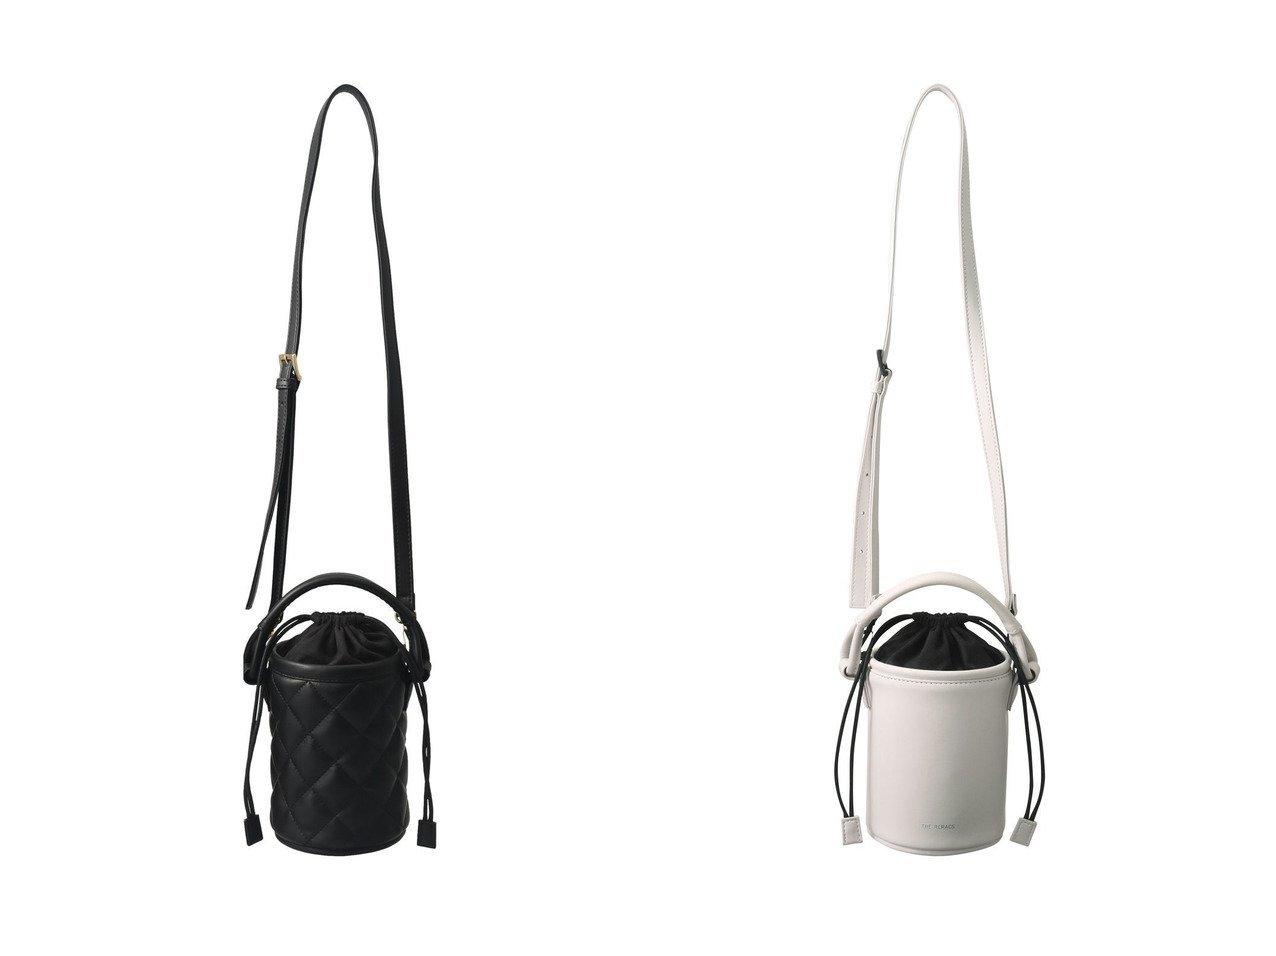 【THE RERACS/ザ リラクス】のミニマムキルトバケットバッグ&シンセティックレザーミニマムバケットバッグ バッグ・鞄のおすすめ!人気、トレンド・レディースファッションの通販 おすすめで人気の流行・トレンド、ファッションの通販商品 メンズファッション・キッズファッション・インテリア・家具・レディースファッション・服の通販 founy(ファニー) https://founy.com/ ファッション Fashion レディースファッション WOMEN バッグ Bag 2021年 2021 2021 春夏 S/S SS Spring/Summer 2021 S/S 春夏 SS Spring/Summer キルティング コンパクト ショルダー バケツ 巾着 春 Spring |ID:crp329100000014987